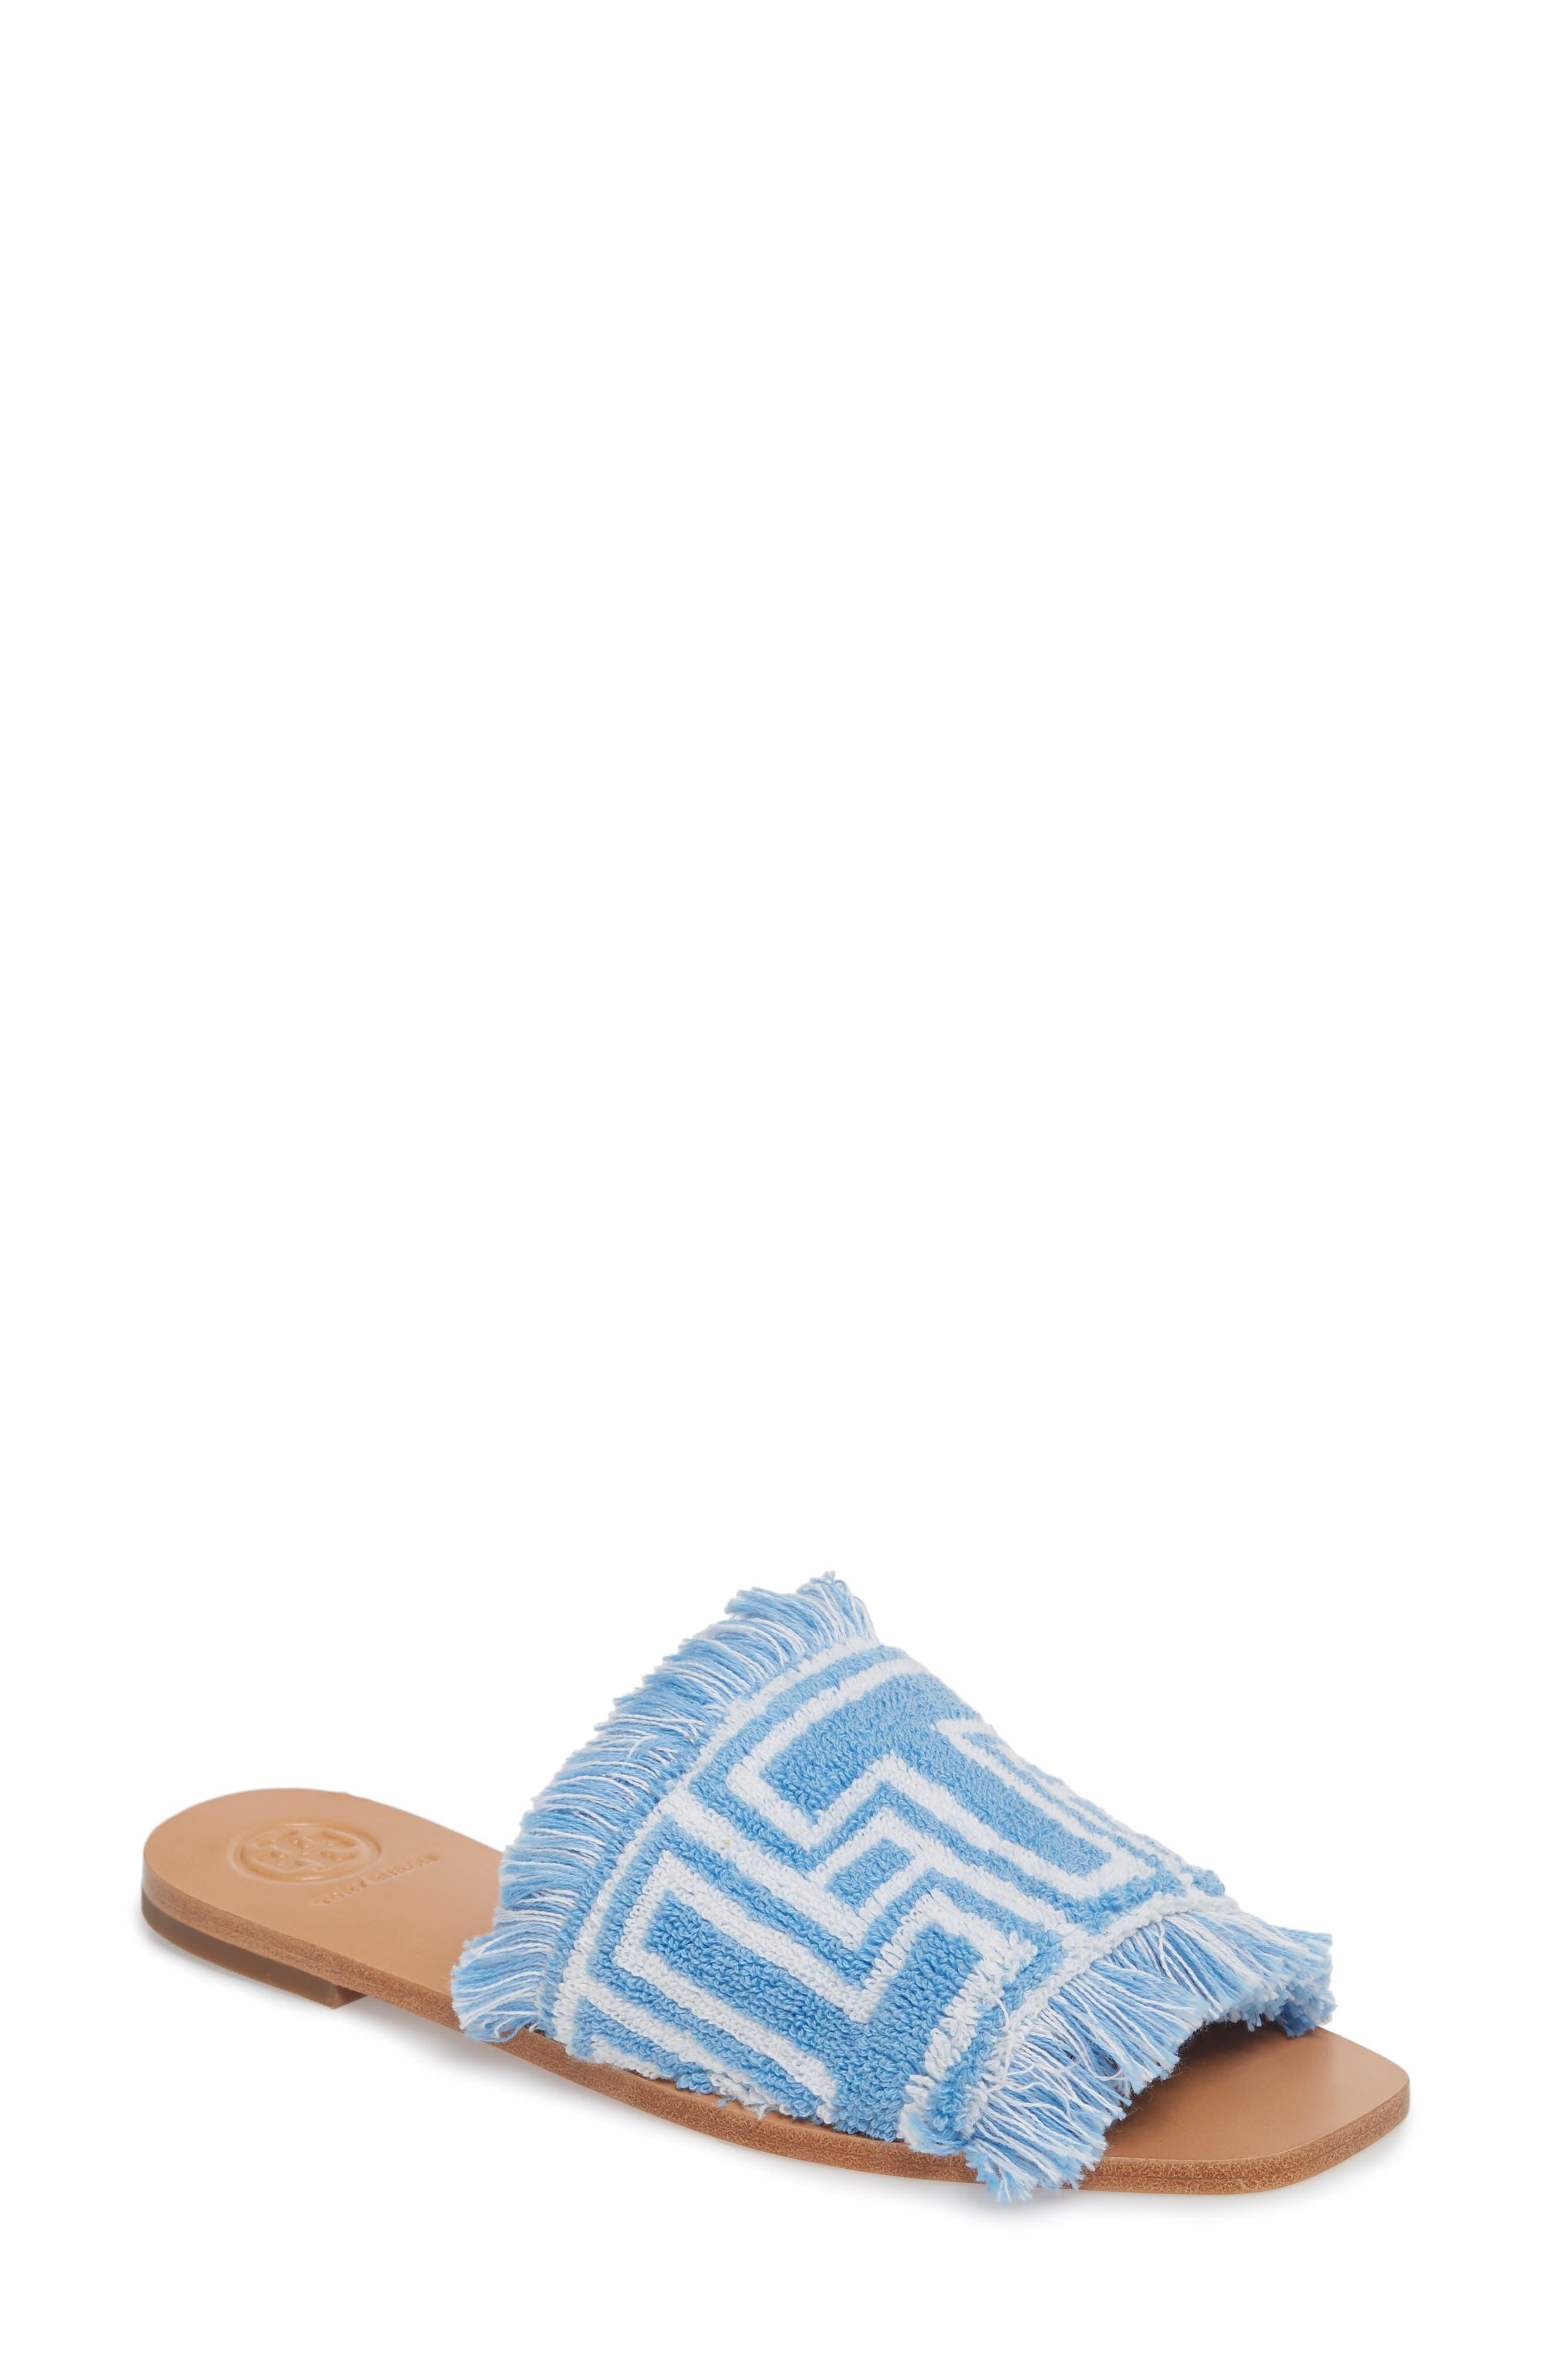 T-Tile Slide Sandal,                             Main thumbnail 1, color,                             412